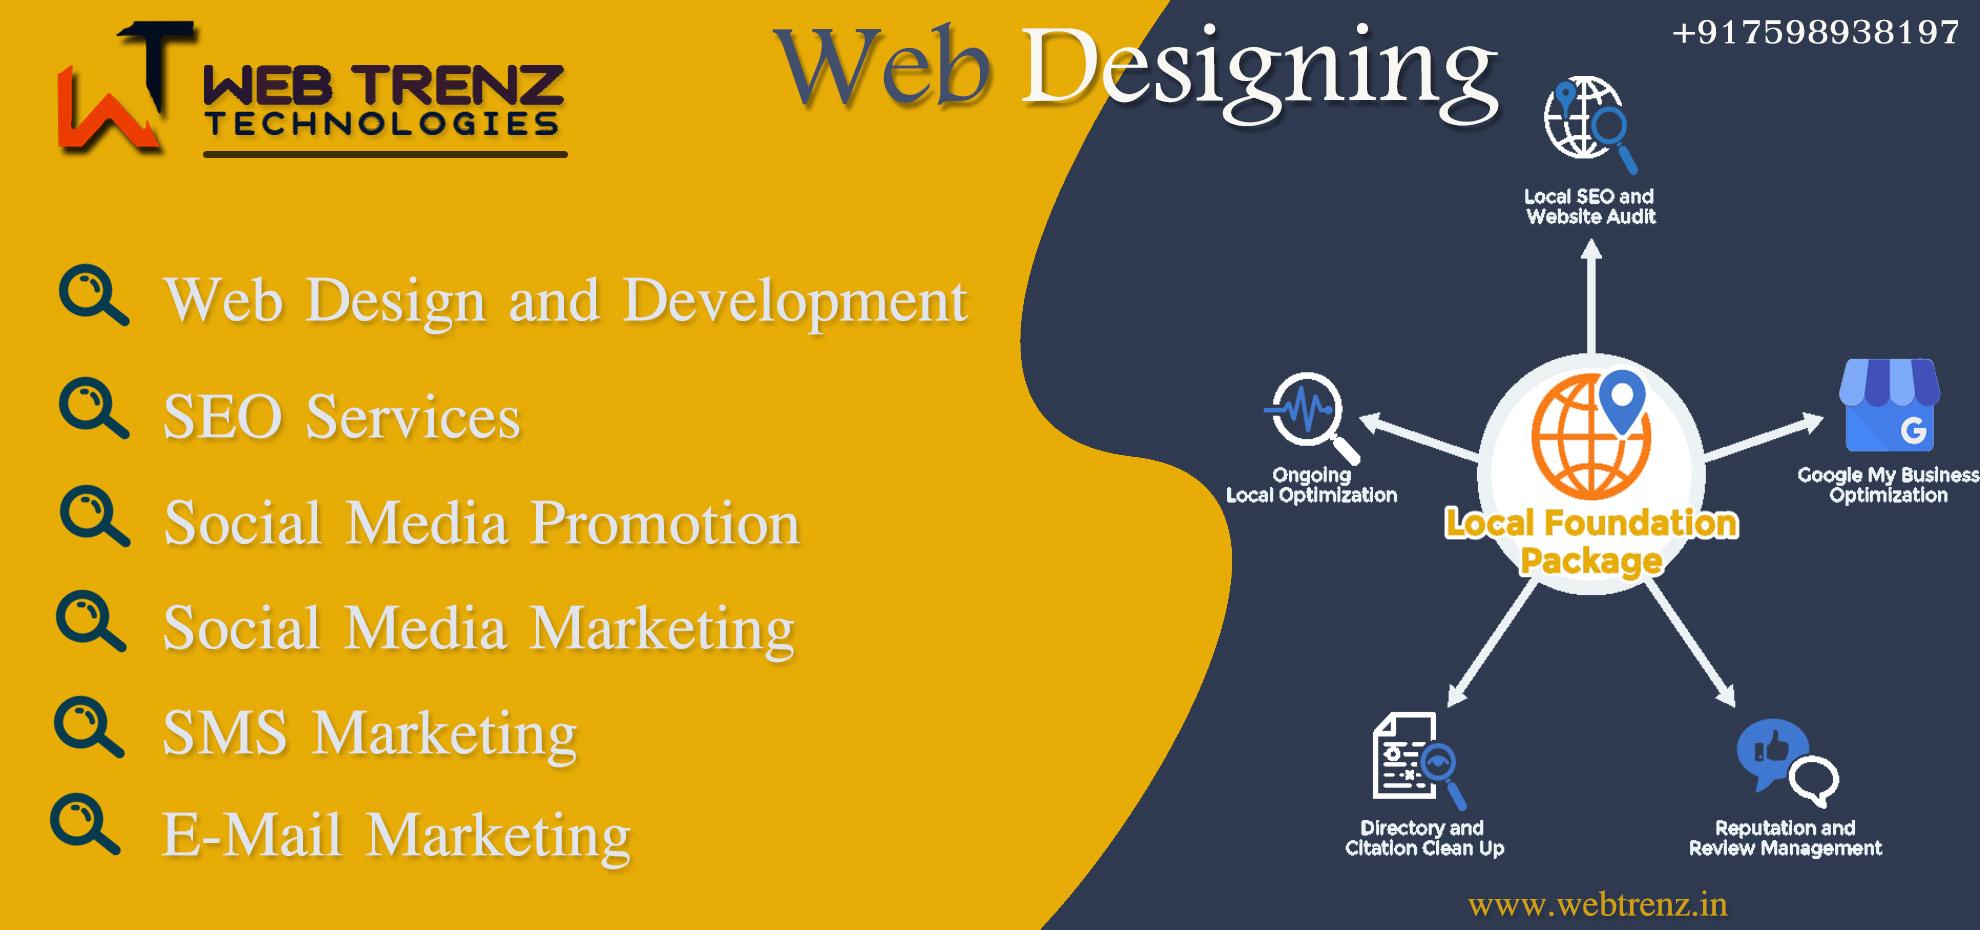 Web Trenz Technologies, Seo Company In Virugambakkam, Seo Company In Vyasarpadi, Seo Company In Washermanpet, Seo Company In West Mambalam, Seo Company In Chennai, Seo Company In Madurai, Seo Company In Ramanathapuram,